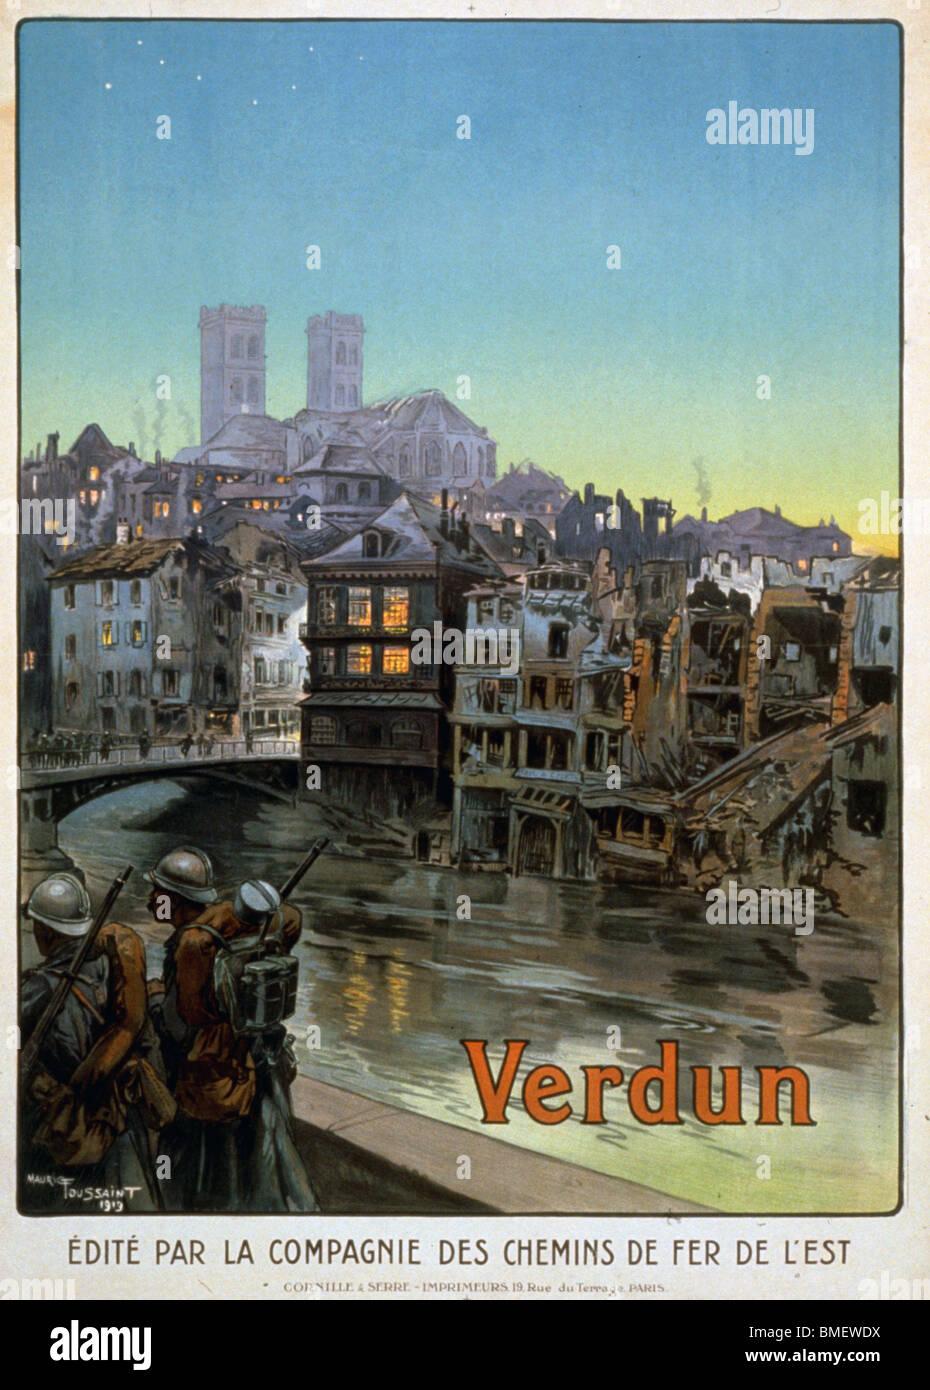 Verdun - French World War I poster - Stock Image